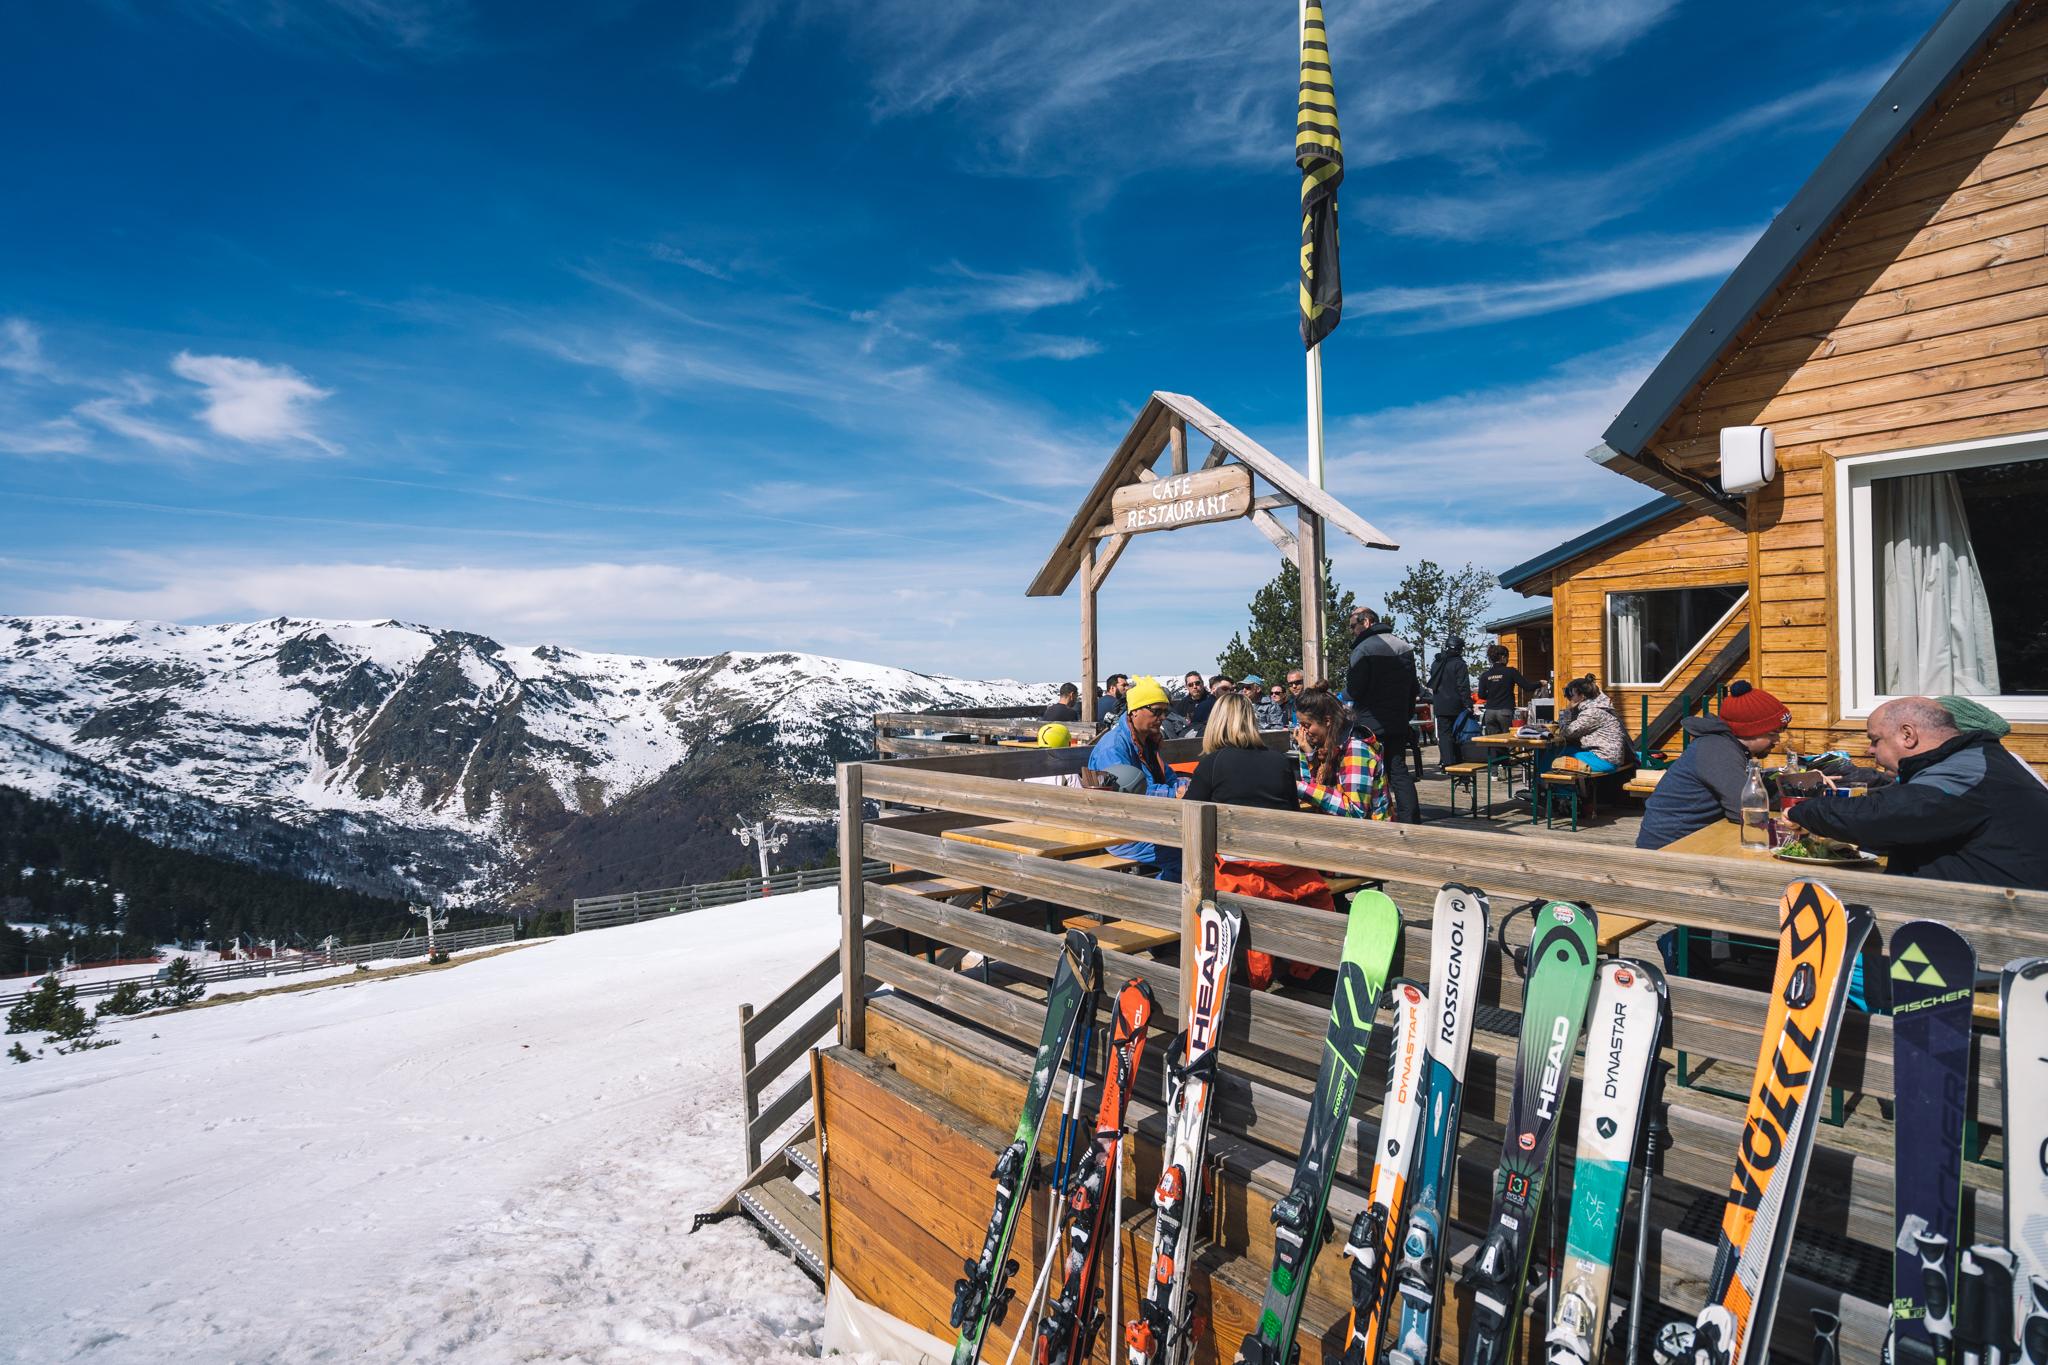 où-manger-ski-ax-3-domainesoù-manger-ski-ax-3-domainesoù-manger-ski-ax-3-domainesoù-manger-ski-ax-3-domainesoù-manger-ski-ax-3-domaines